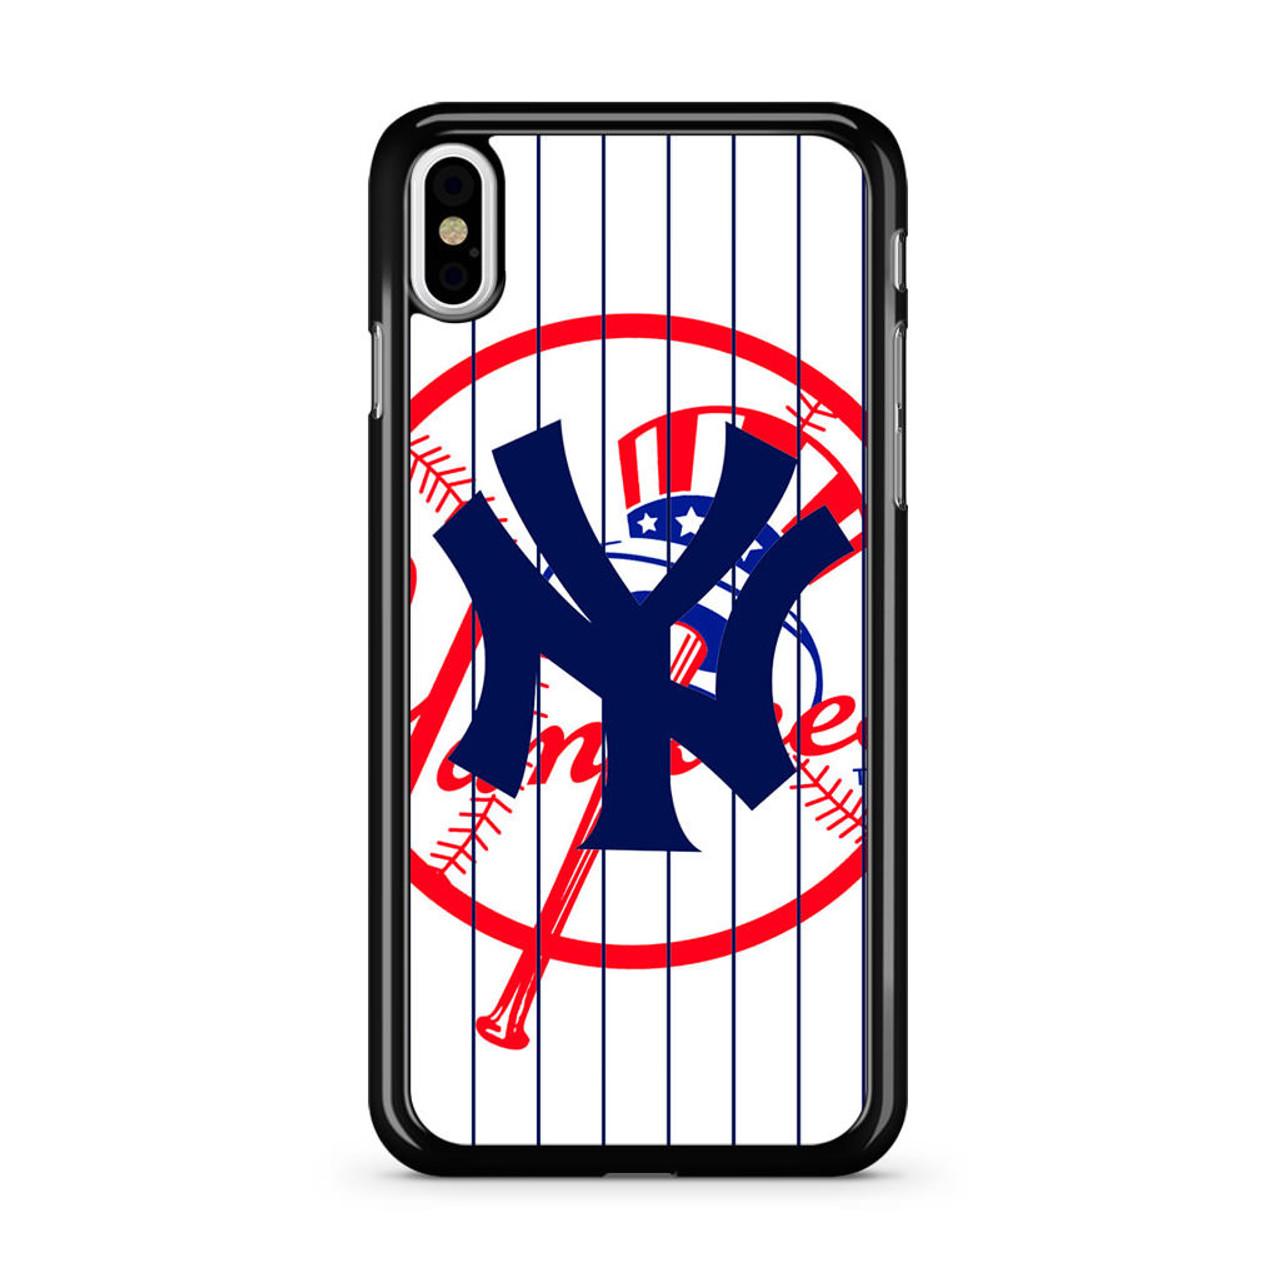 promo code 479b8 6e0d4 New York Yankees iPhone X Case